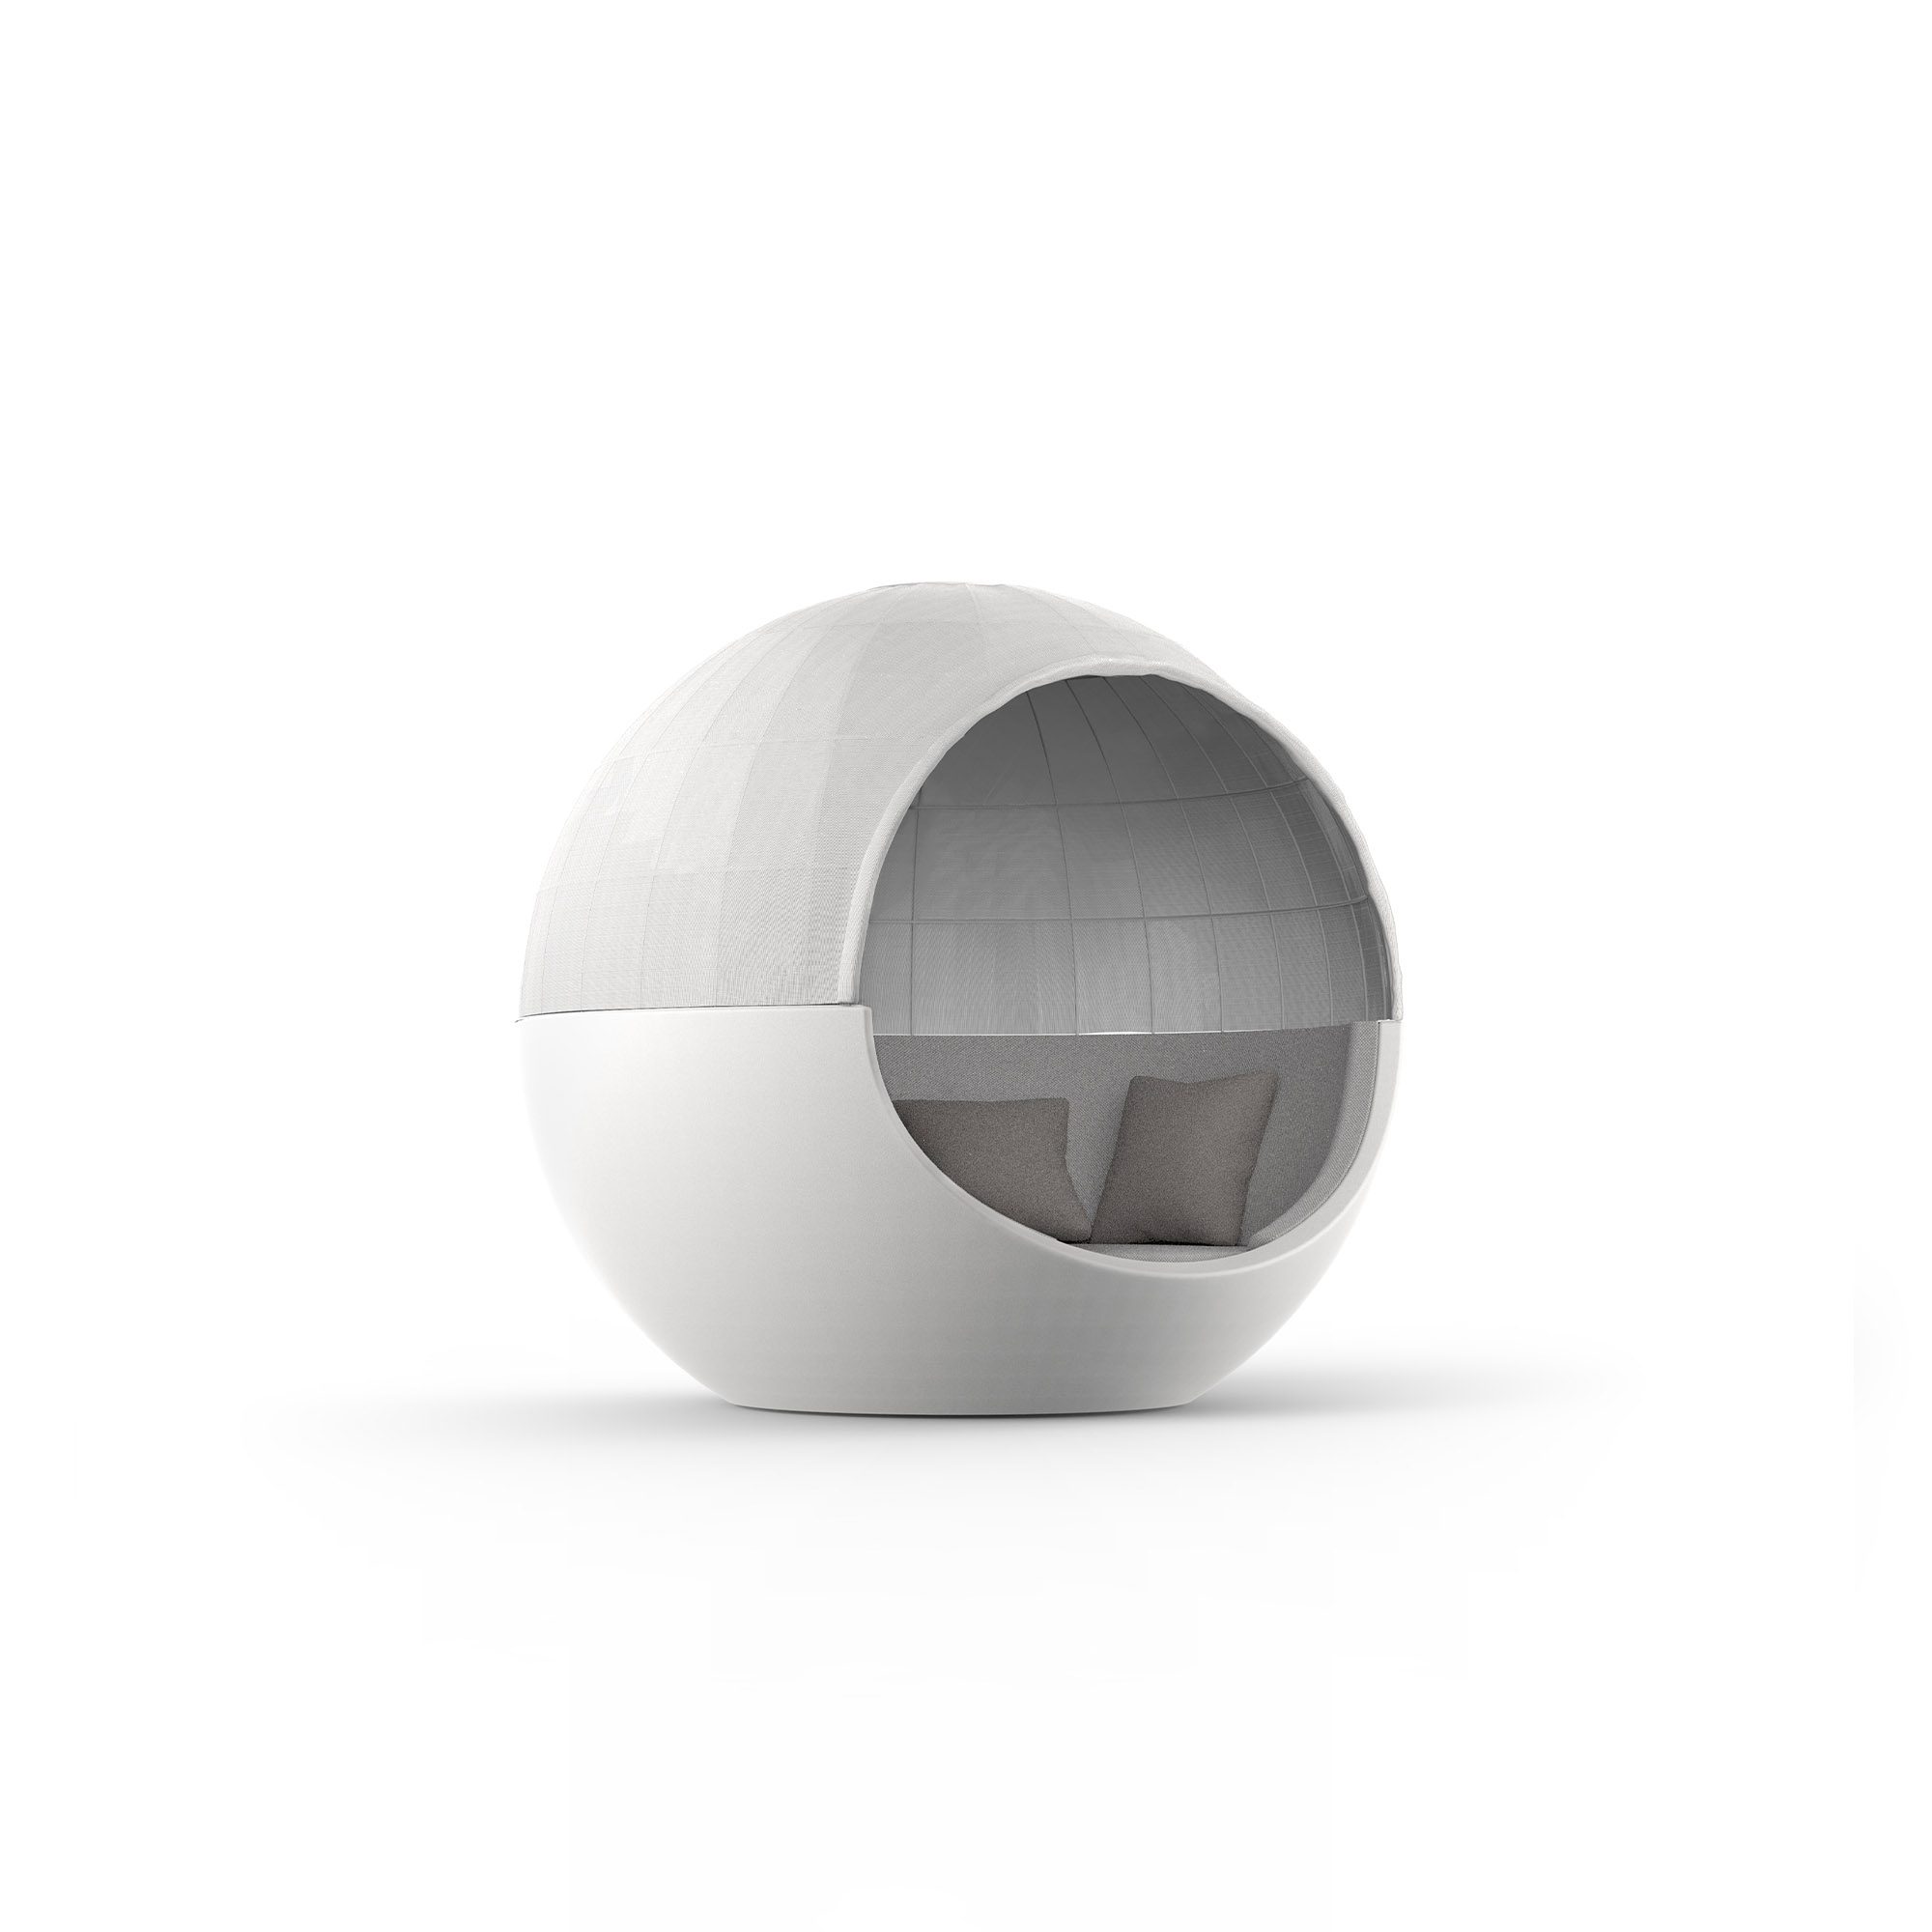 MOON_ULM_DAYBED VONDOM OUTDOOR DESIGN BED POOL LUXURY DISENO EXTERIOR(1)